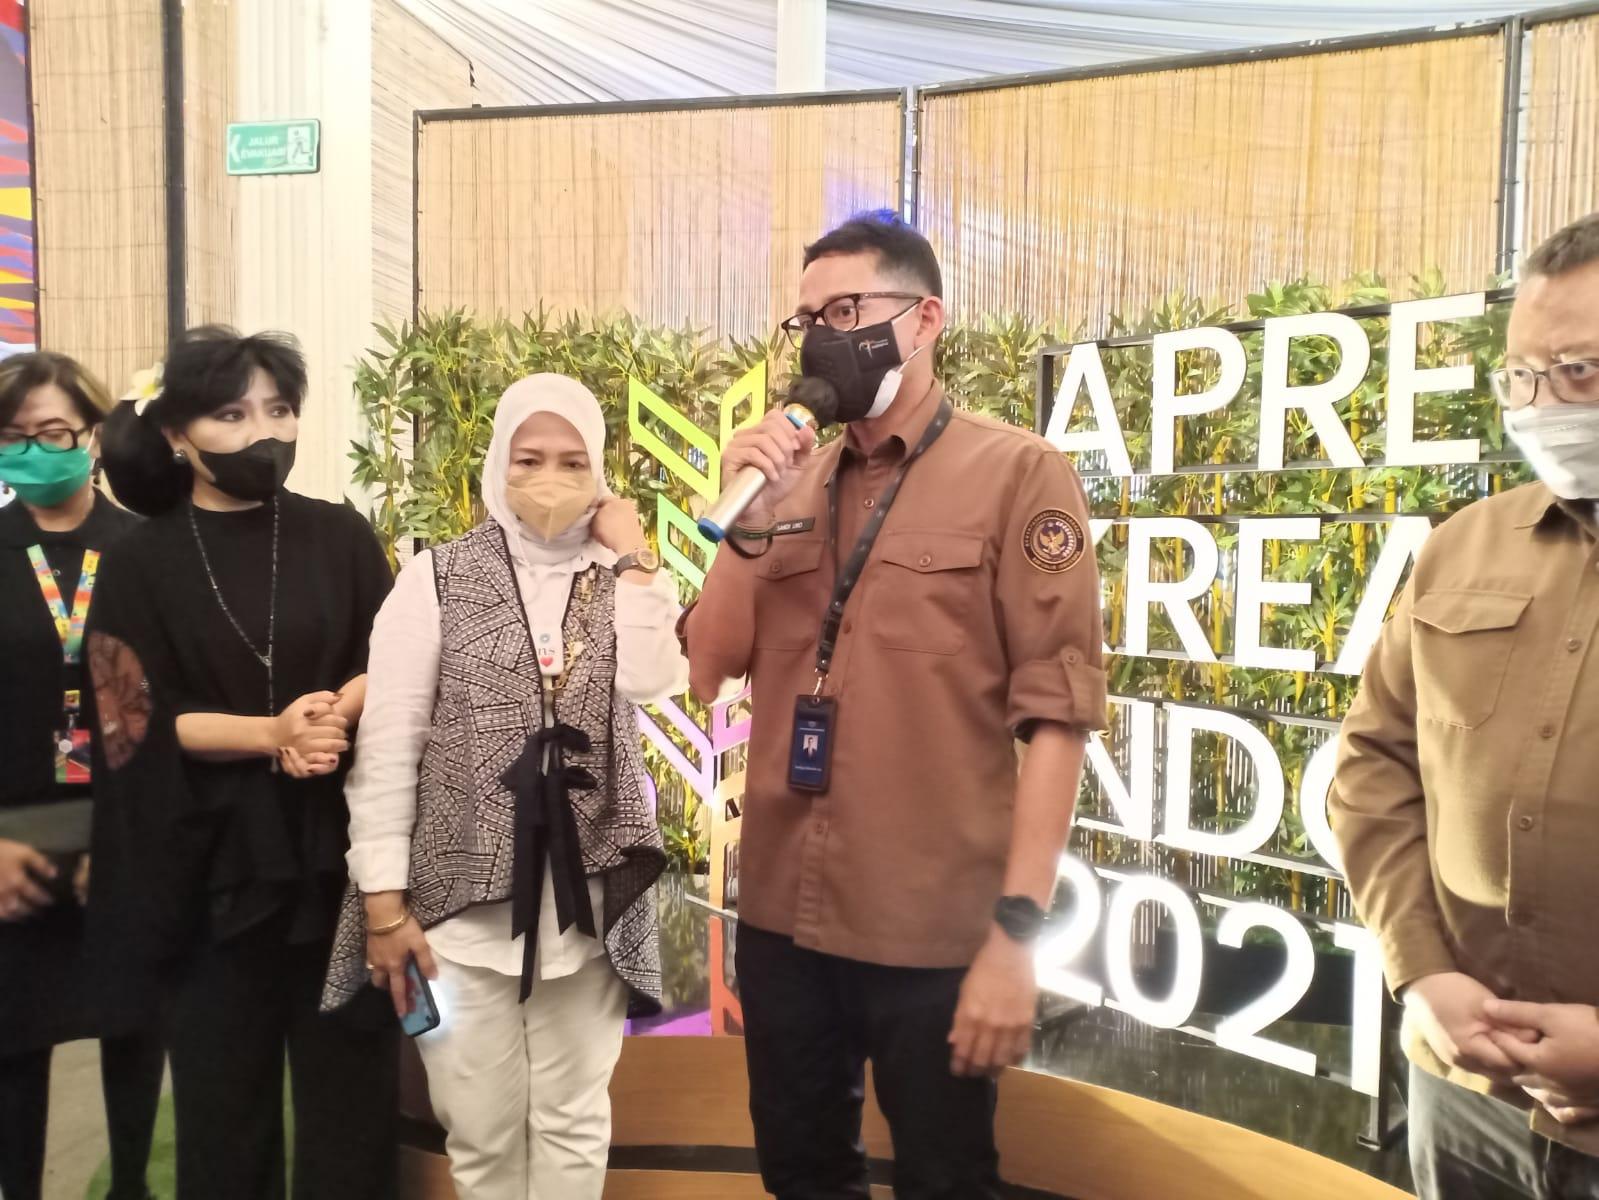 Menteri Pariwisata dan Ekonomi Kreatif (Menparekraf) Sandiaga Uno saat jumpa pers di kawasan PRPP Kota Semarang, Jawa Tengah, Rabu (6/10/2021). REZANDA AKBAR D/LINGKAR.CO